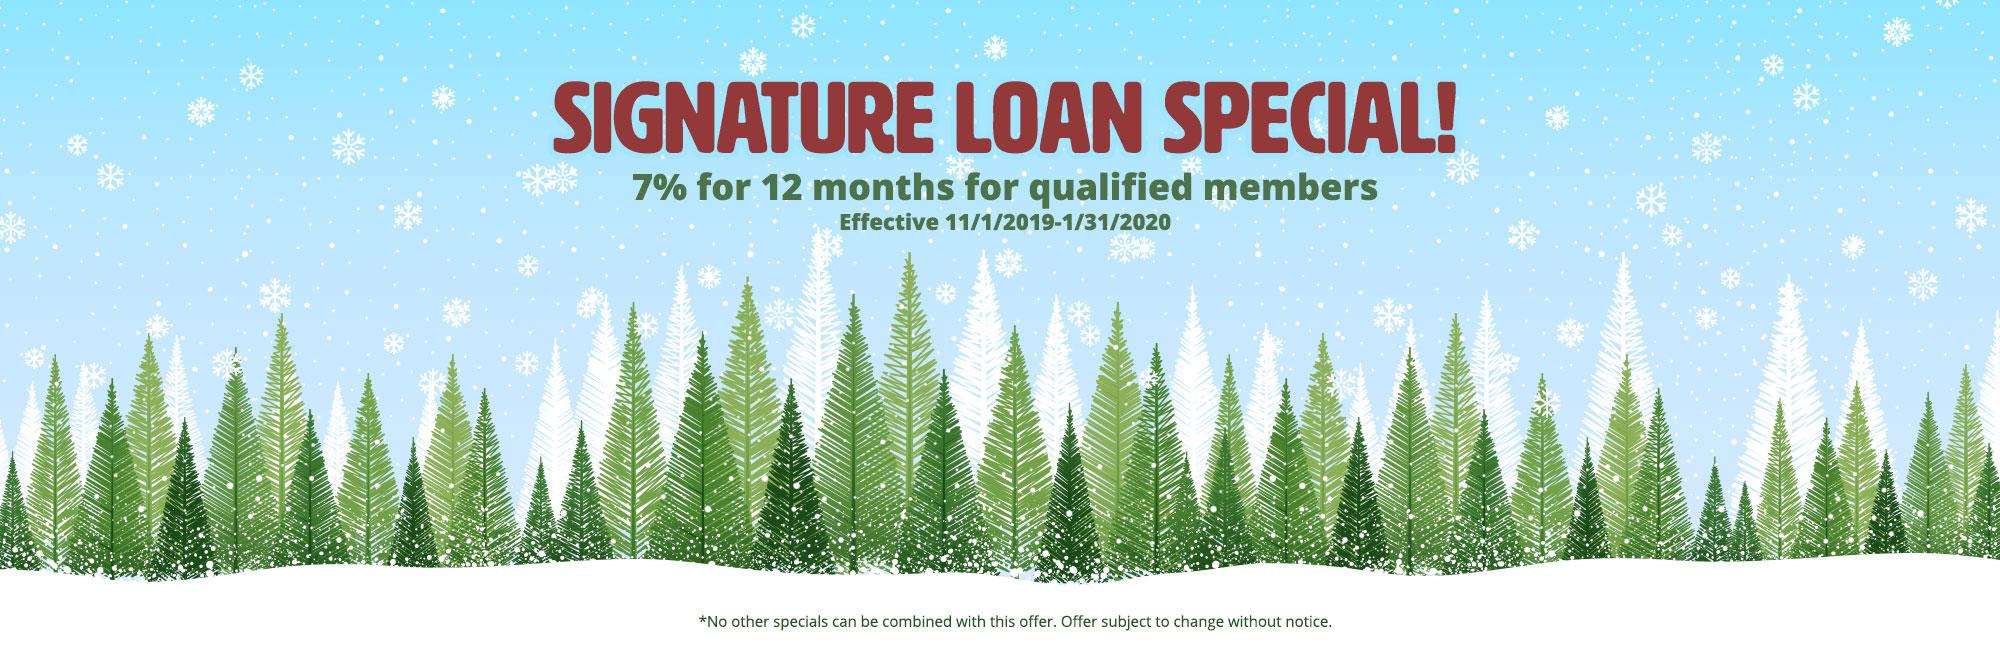 Signature Loan banner